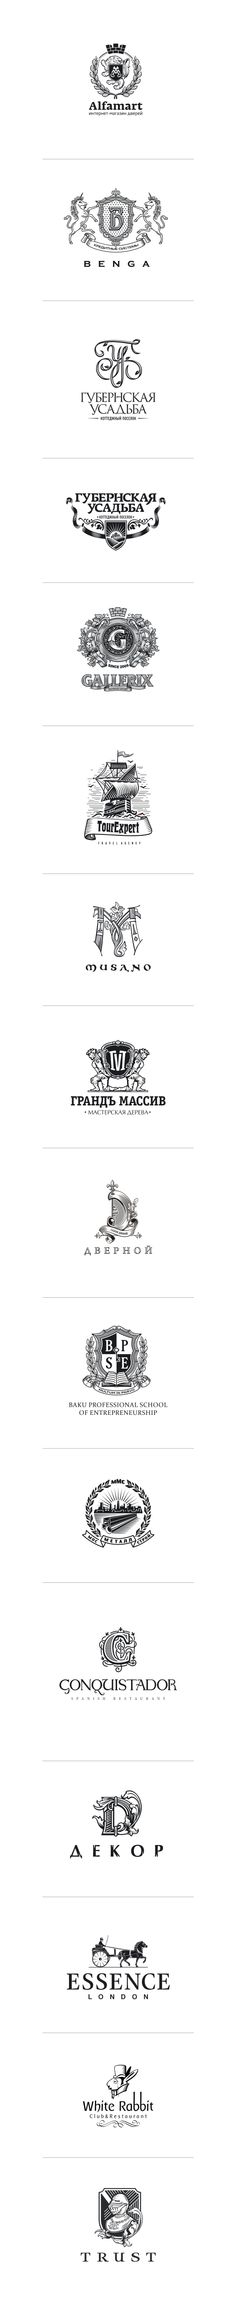 Logos in heraldic style by Alexey Markin, via Behance